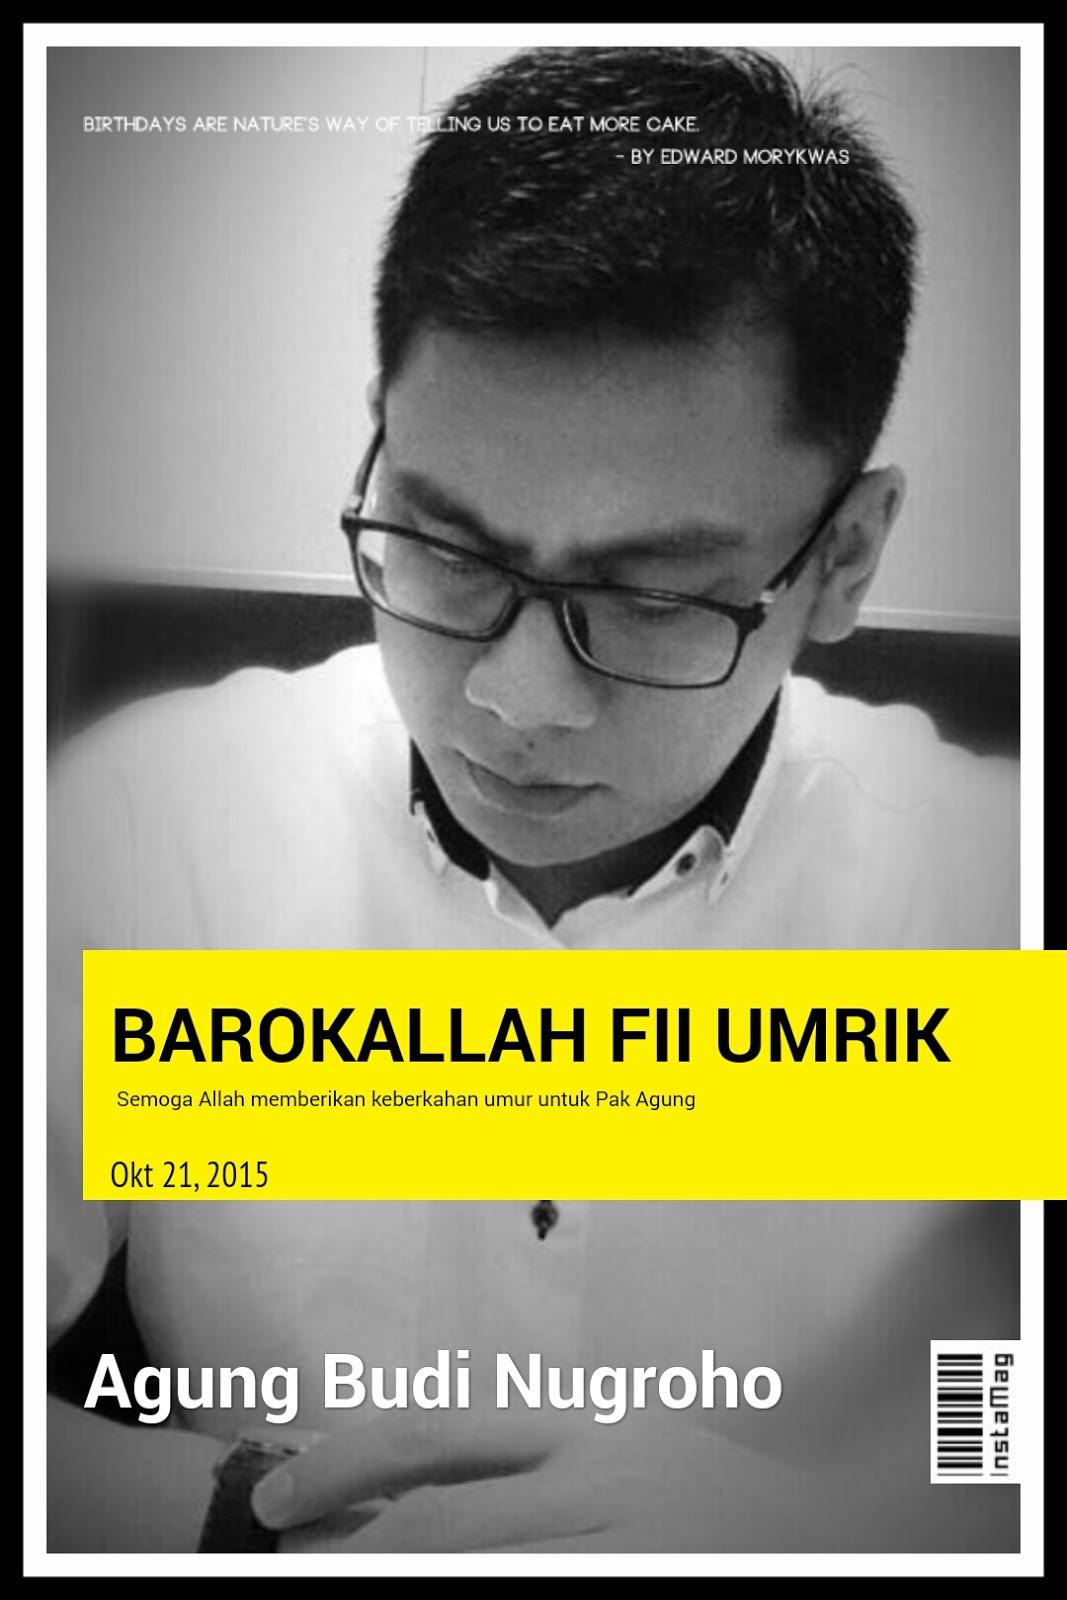 Ayam Bakar Mbak Retno Kuliner Makanan Rumah By Kebab Bdg Dr